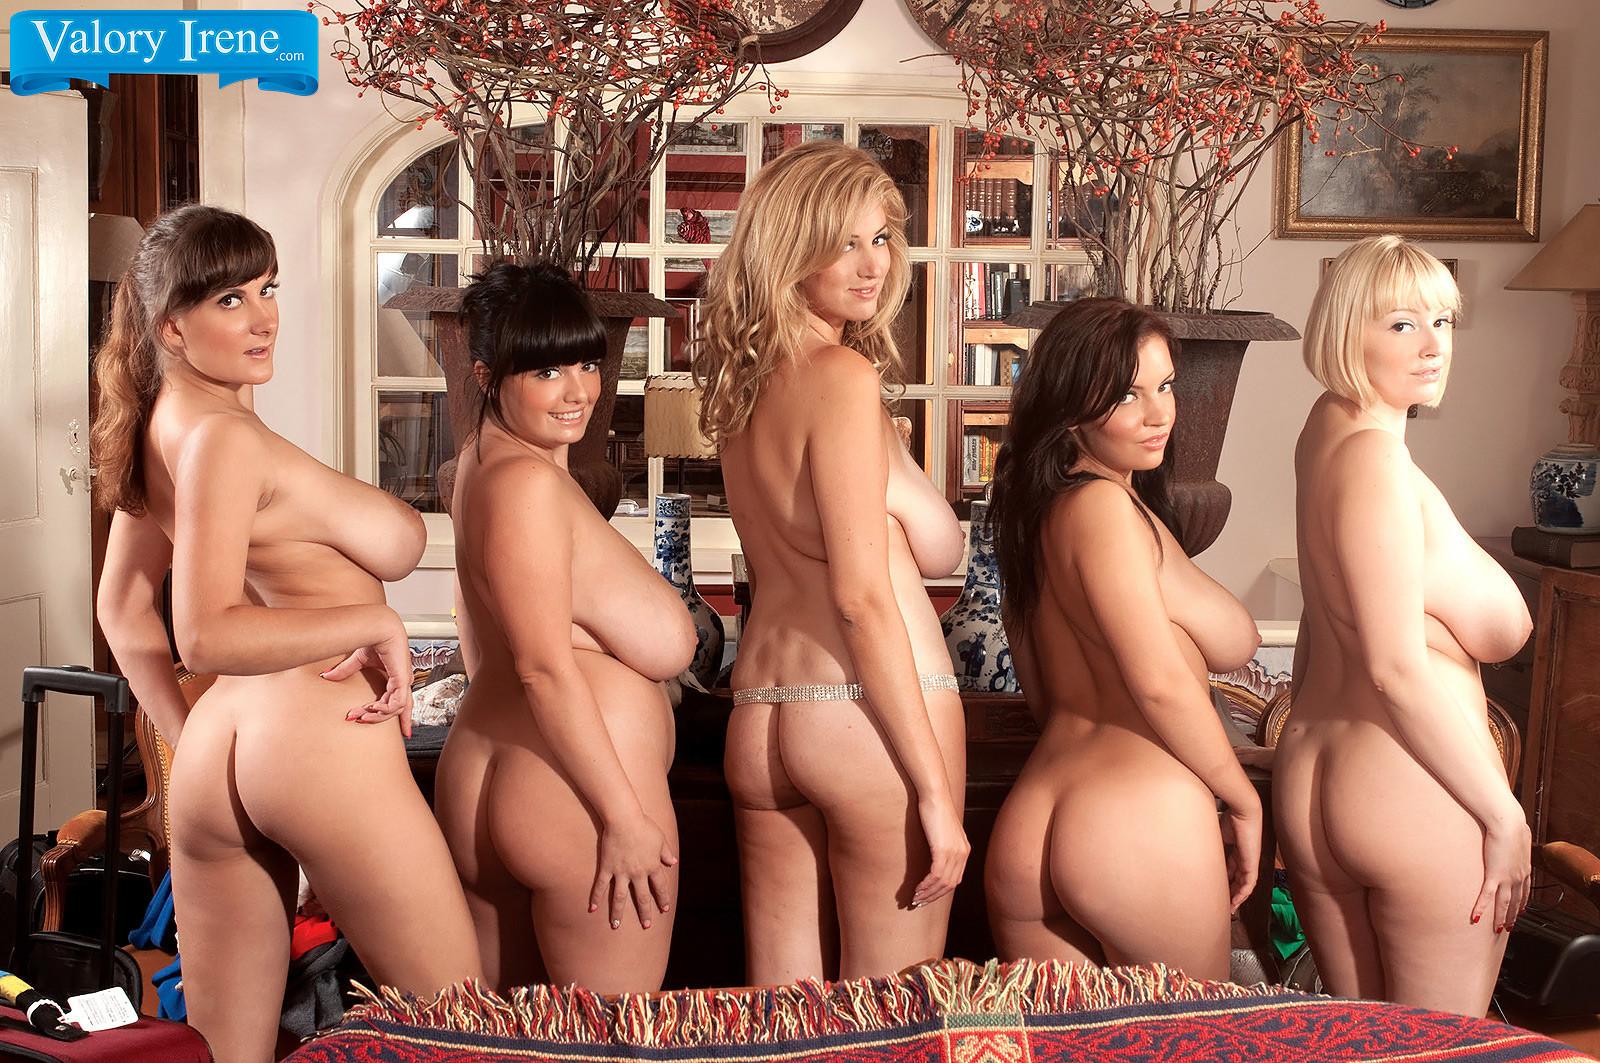 Curvy hot mom nudes